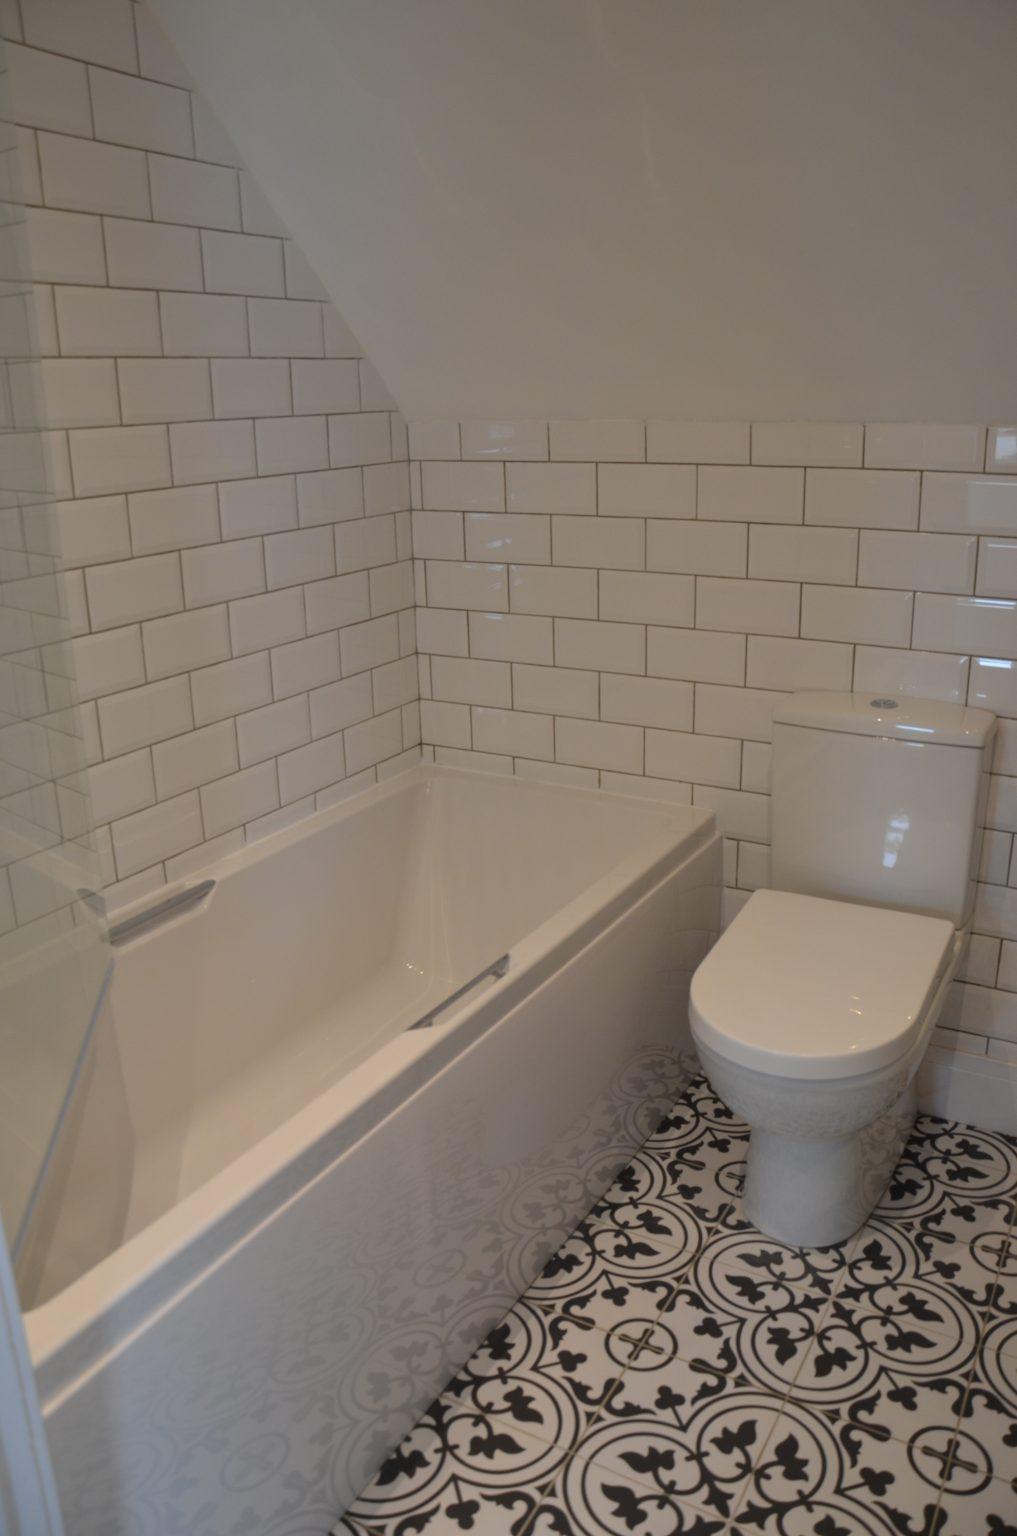 Croft4 bathroom, Isle of Skye holiday accommodation, self catering cottage Scotland